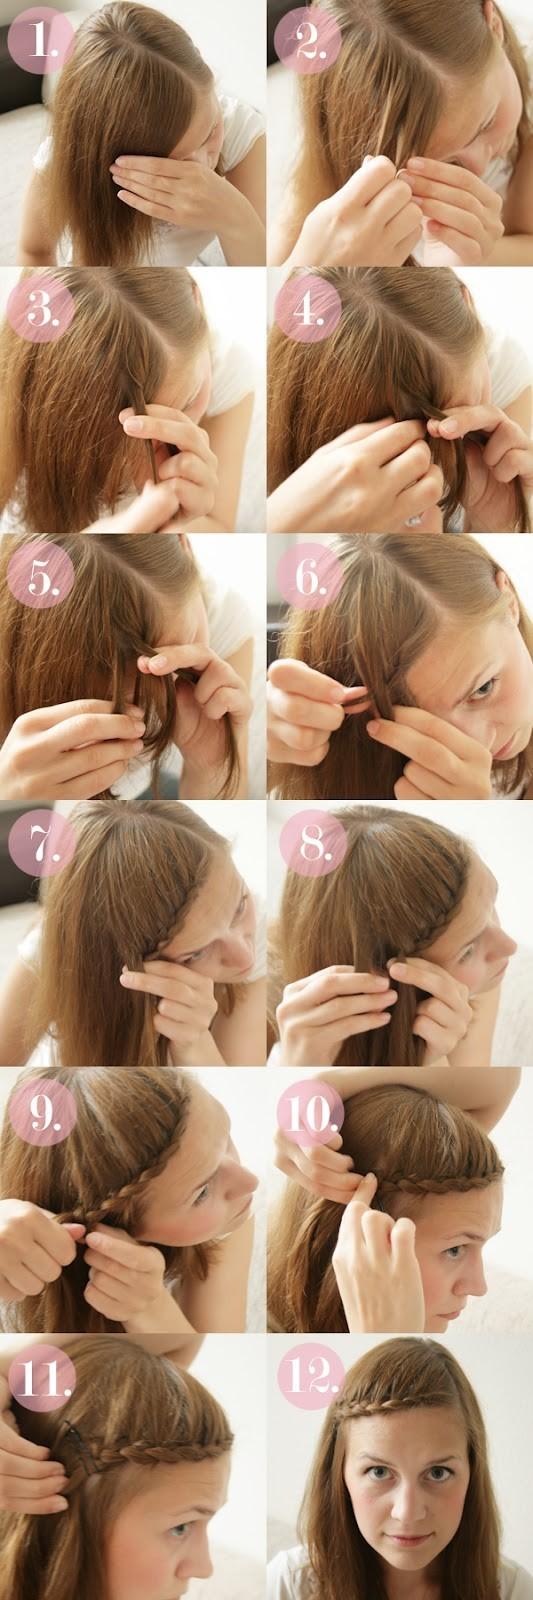 Phenomenal 15 Braided Bangs Tutorials Cute Easy Hairstyles Pretty Designs Hairstyles For Women Draintrainus